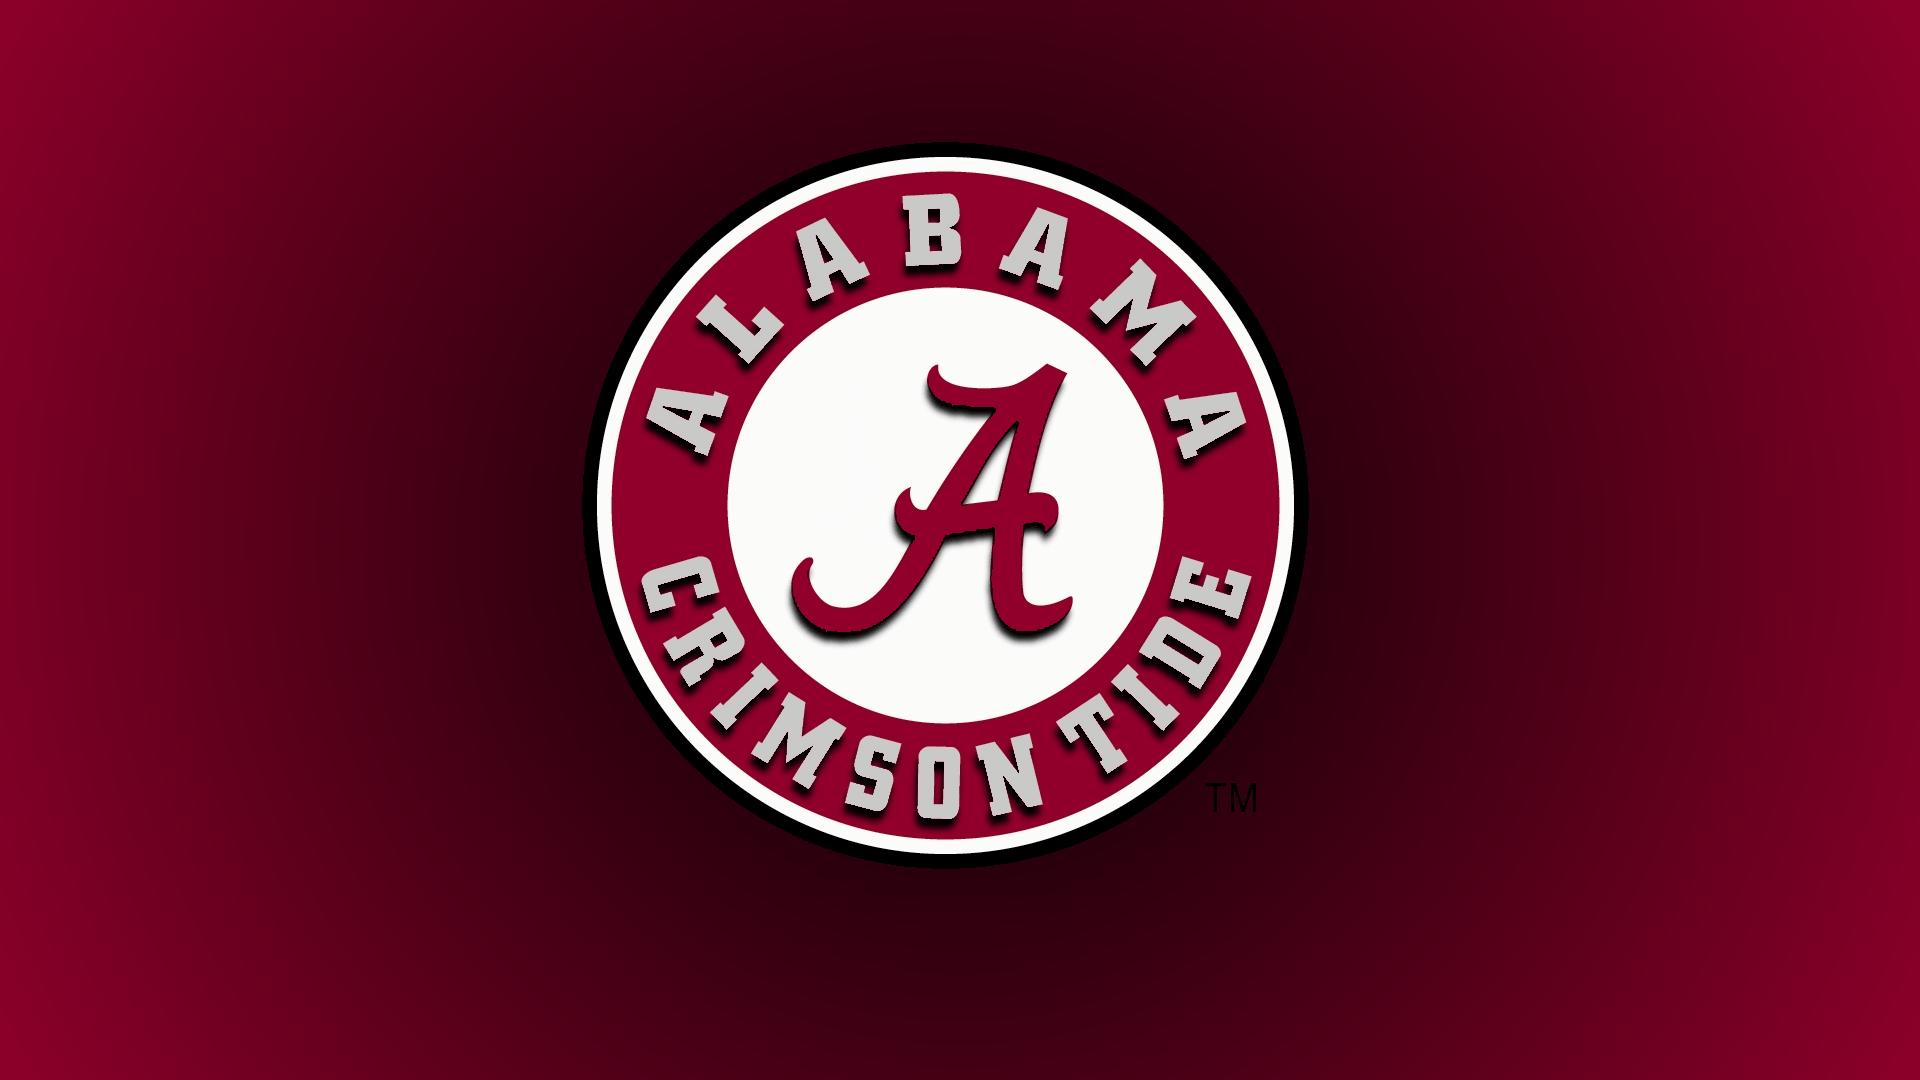 Gallery of crimson alabama roll tide logo 1920x1080